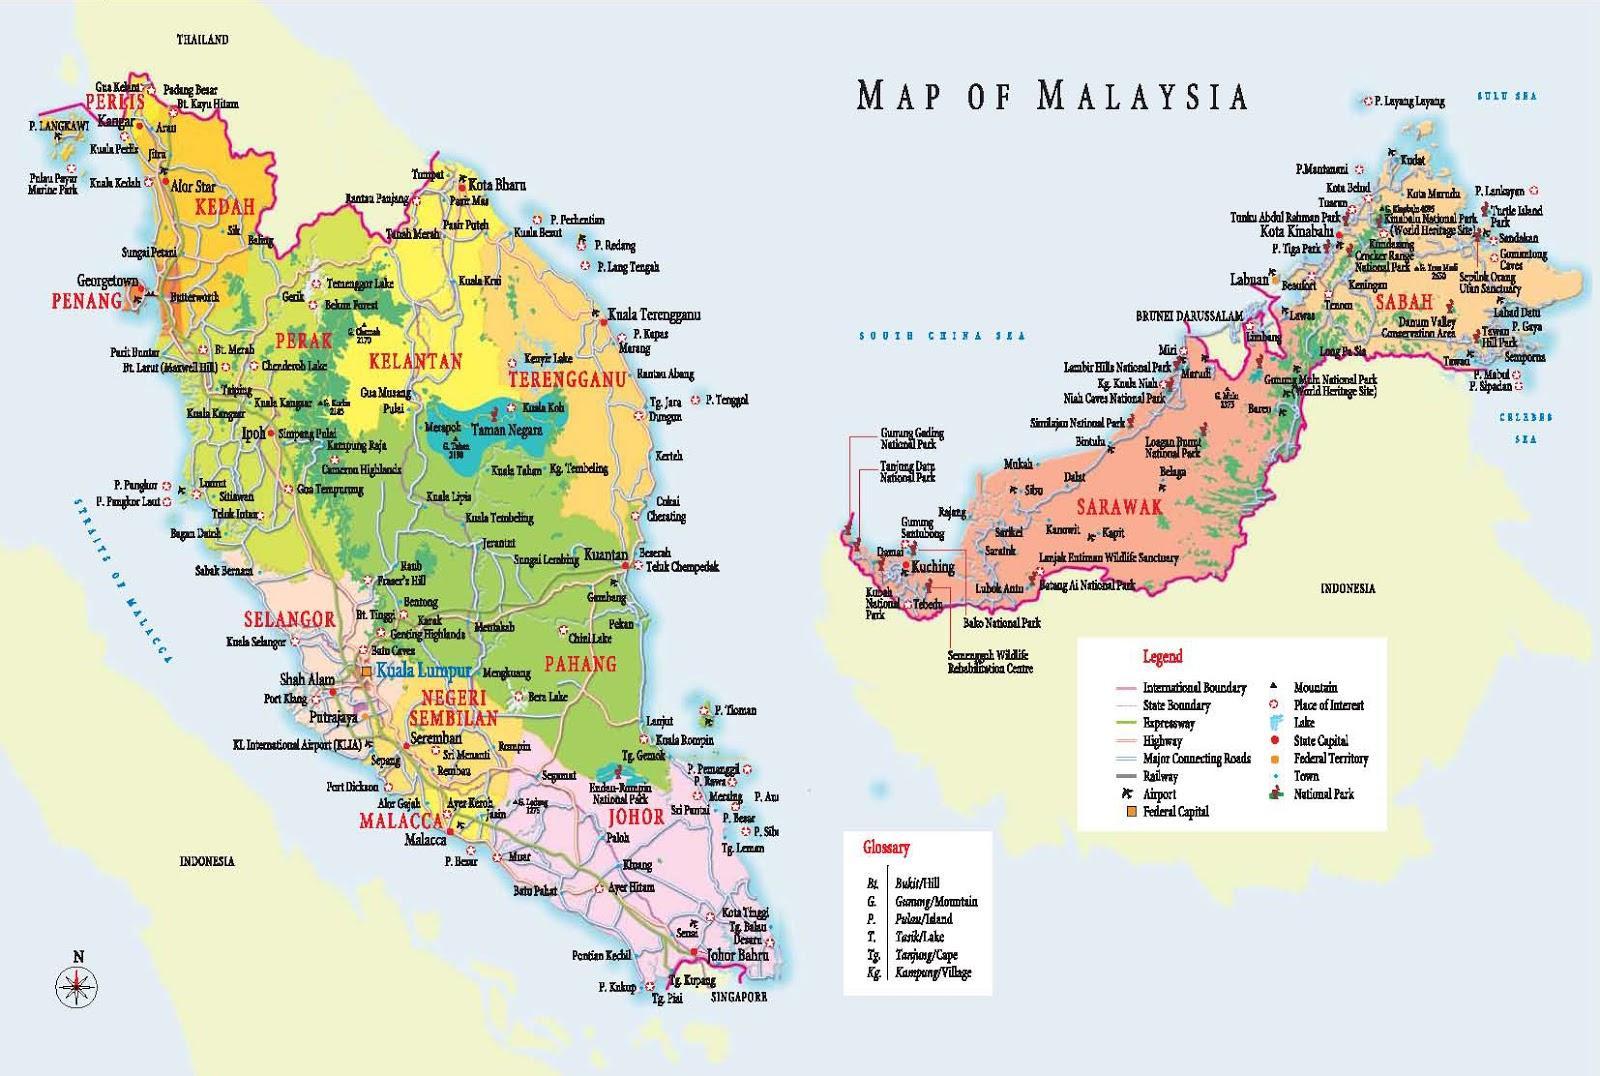 Carte Touristique Asie.La Malaisie Carte Touristique Carte Touristique De La